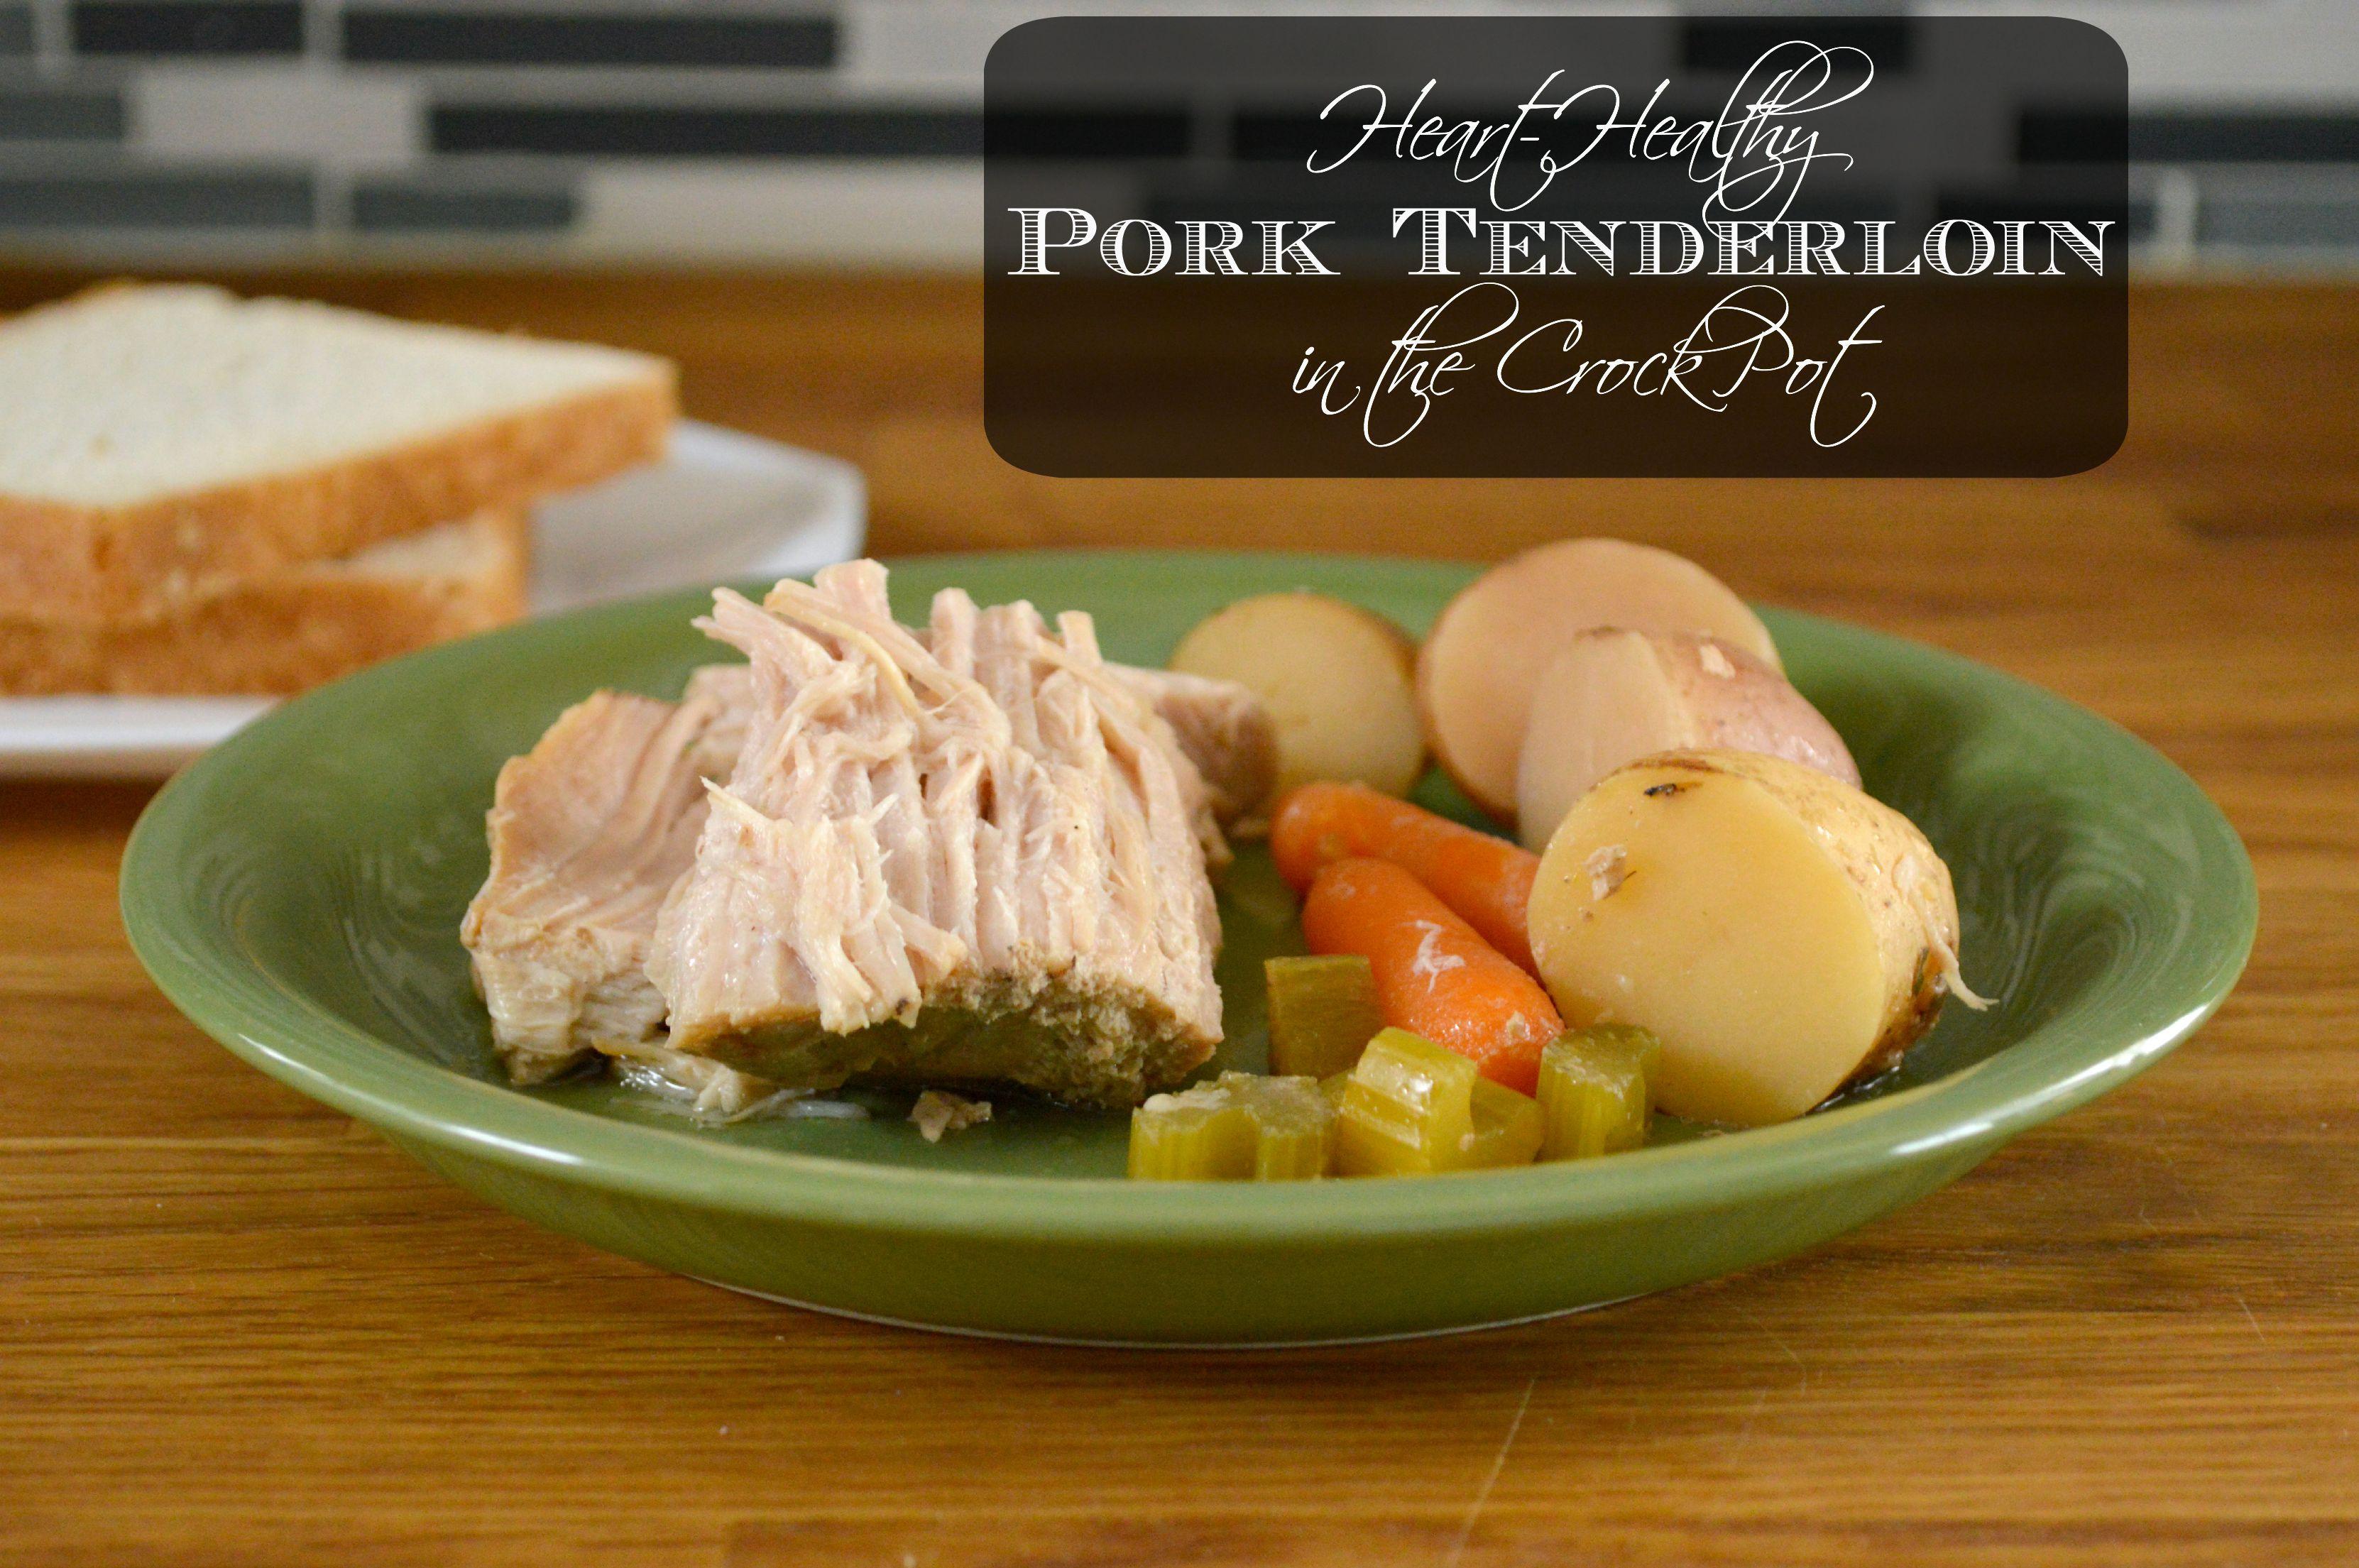 Heart Healthy Crock Pot Recipes  Heart Healthy Crock Pot Pork Tenderloin SoFabFood